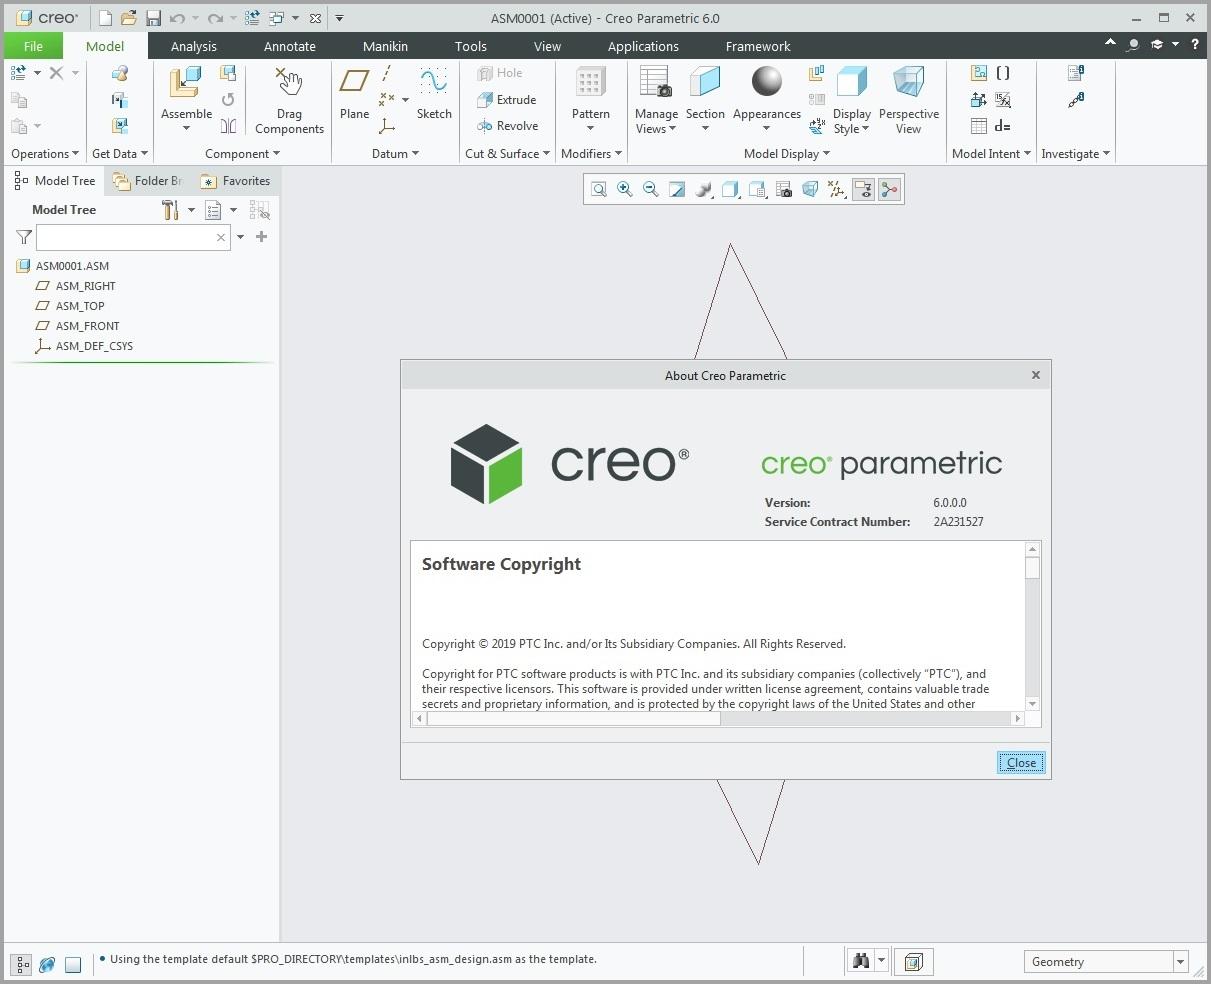 Design with PTC Creo 6.0.0.0 full